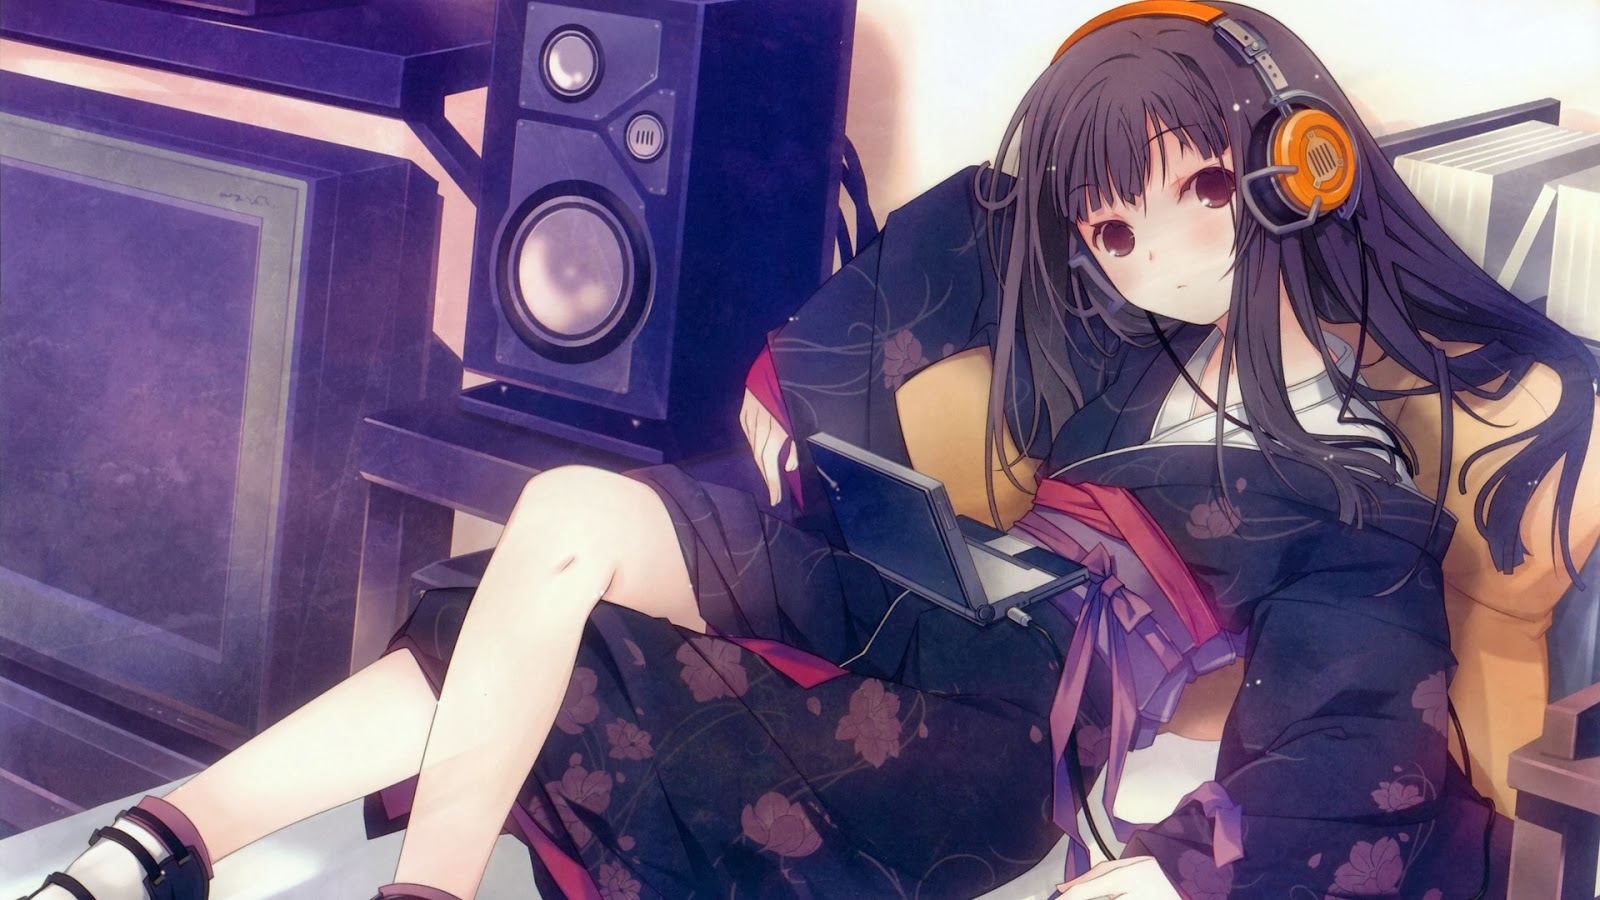 anime music images k - photo #33